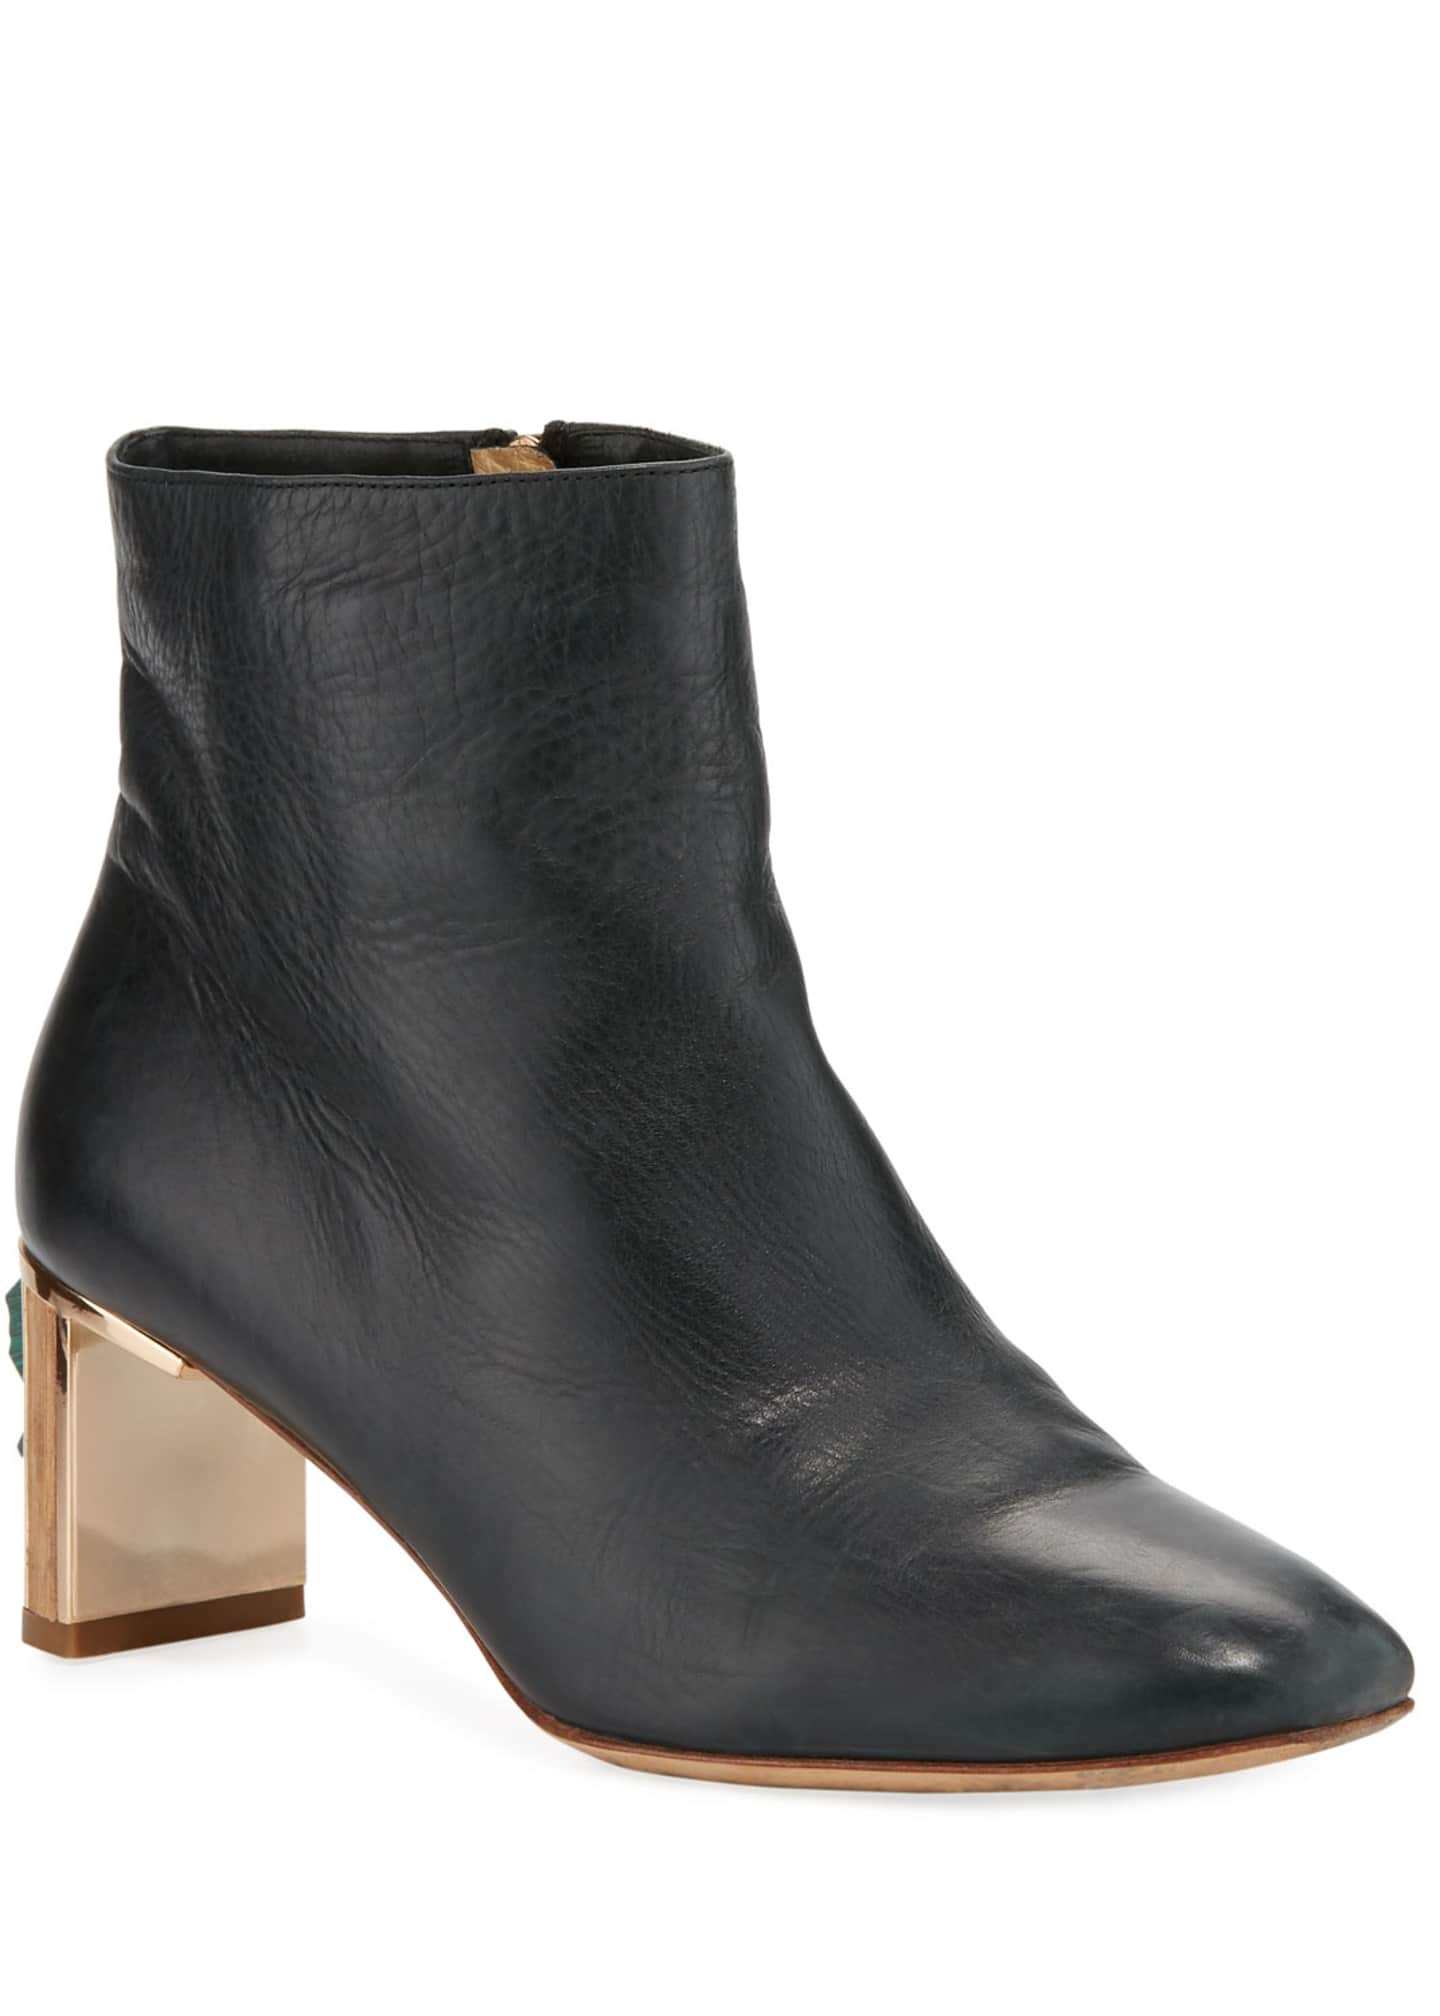 Gabriela Hearst Ruben Combat Boots w/ Jeweled Heel